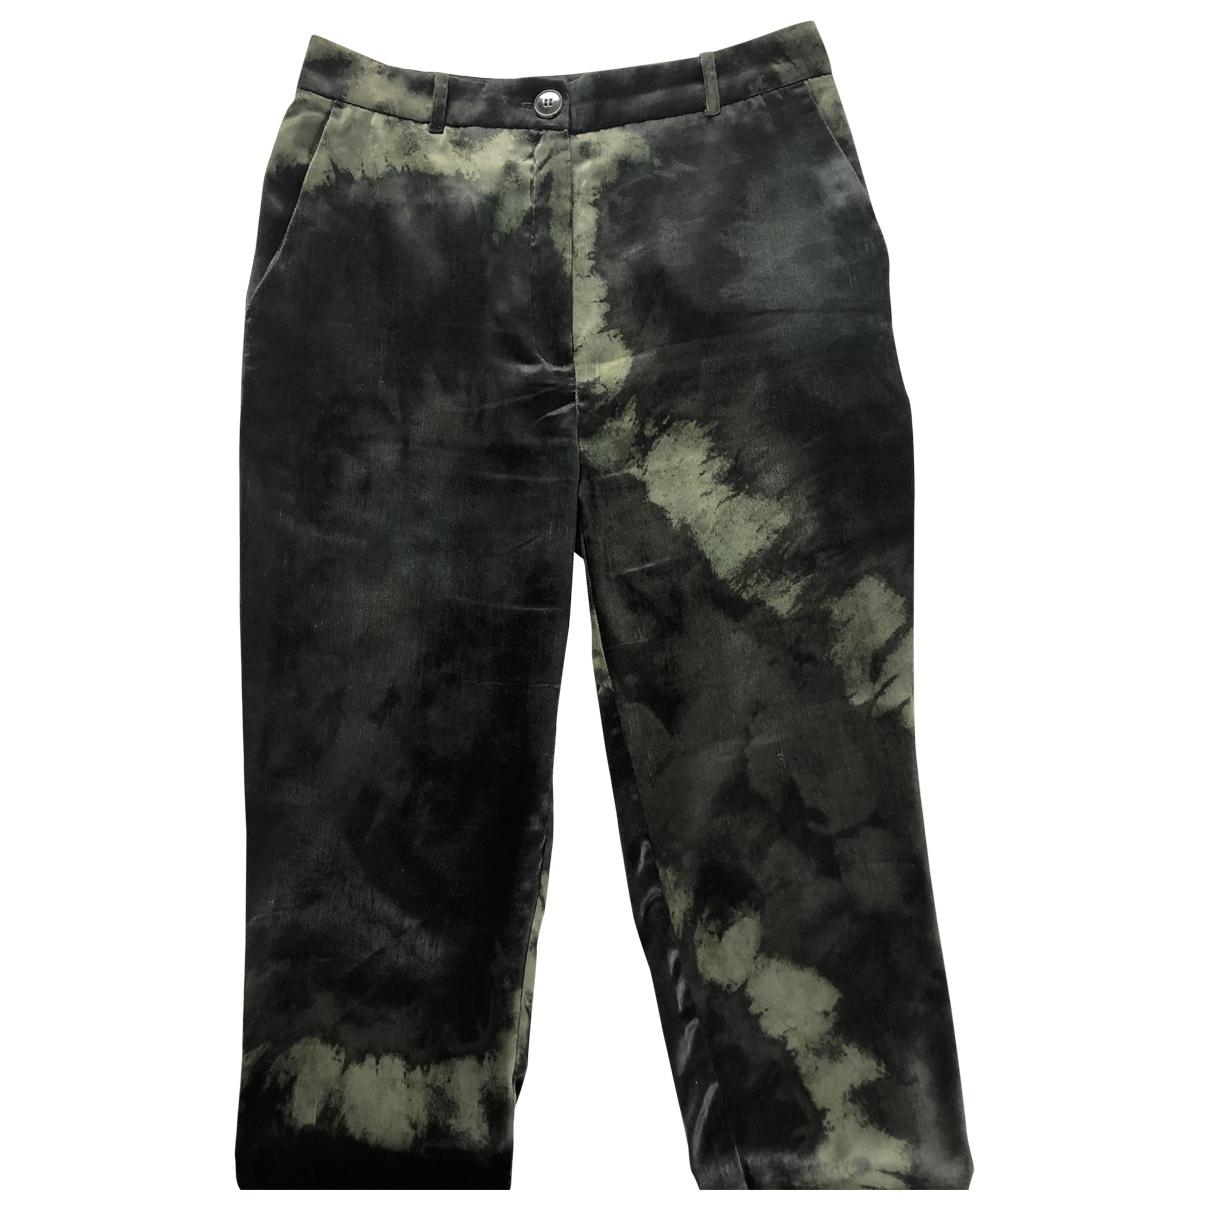 Mango \N Green Trousers for Women S International